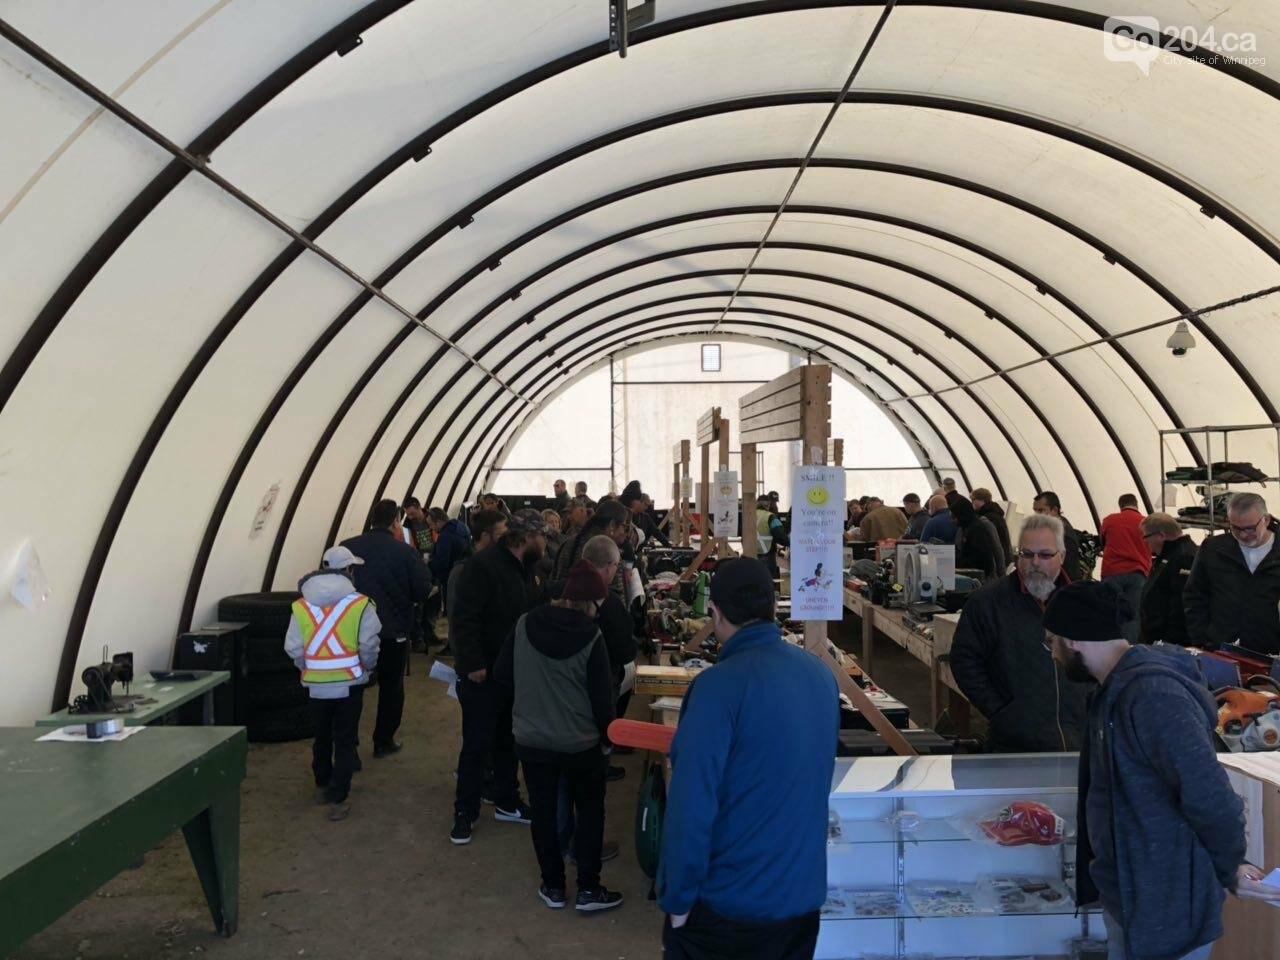 Winnipeg Police Service Unclaimed Goods Auction, photo-1